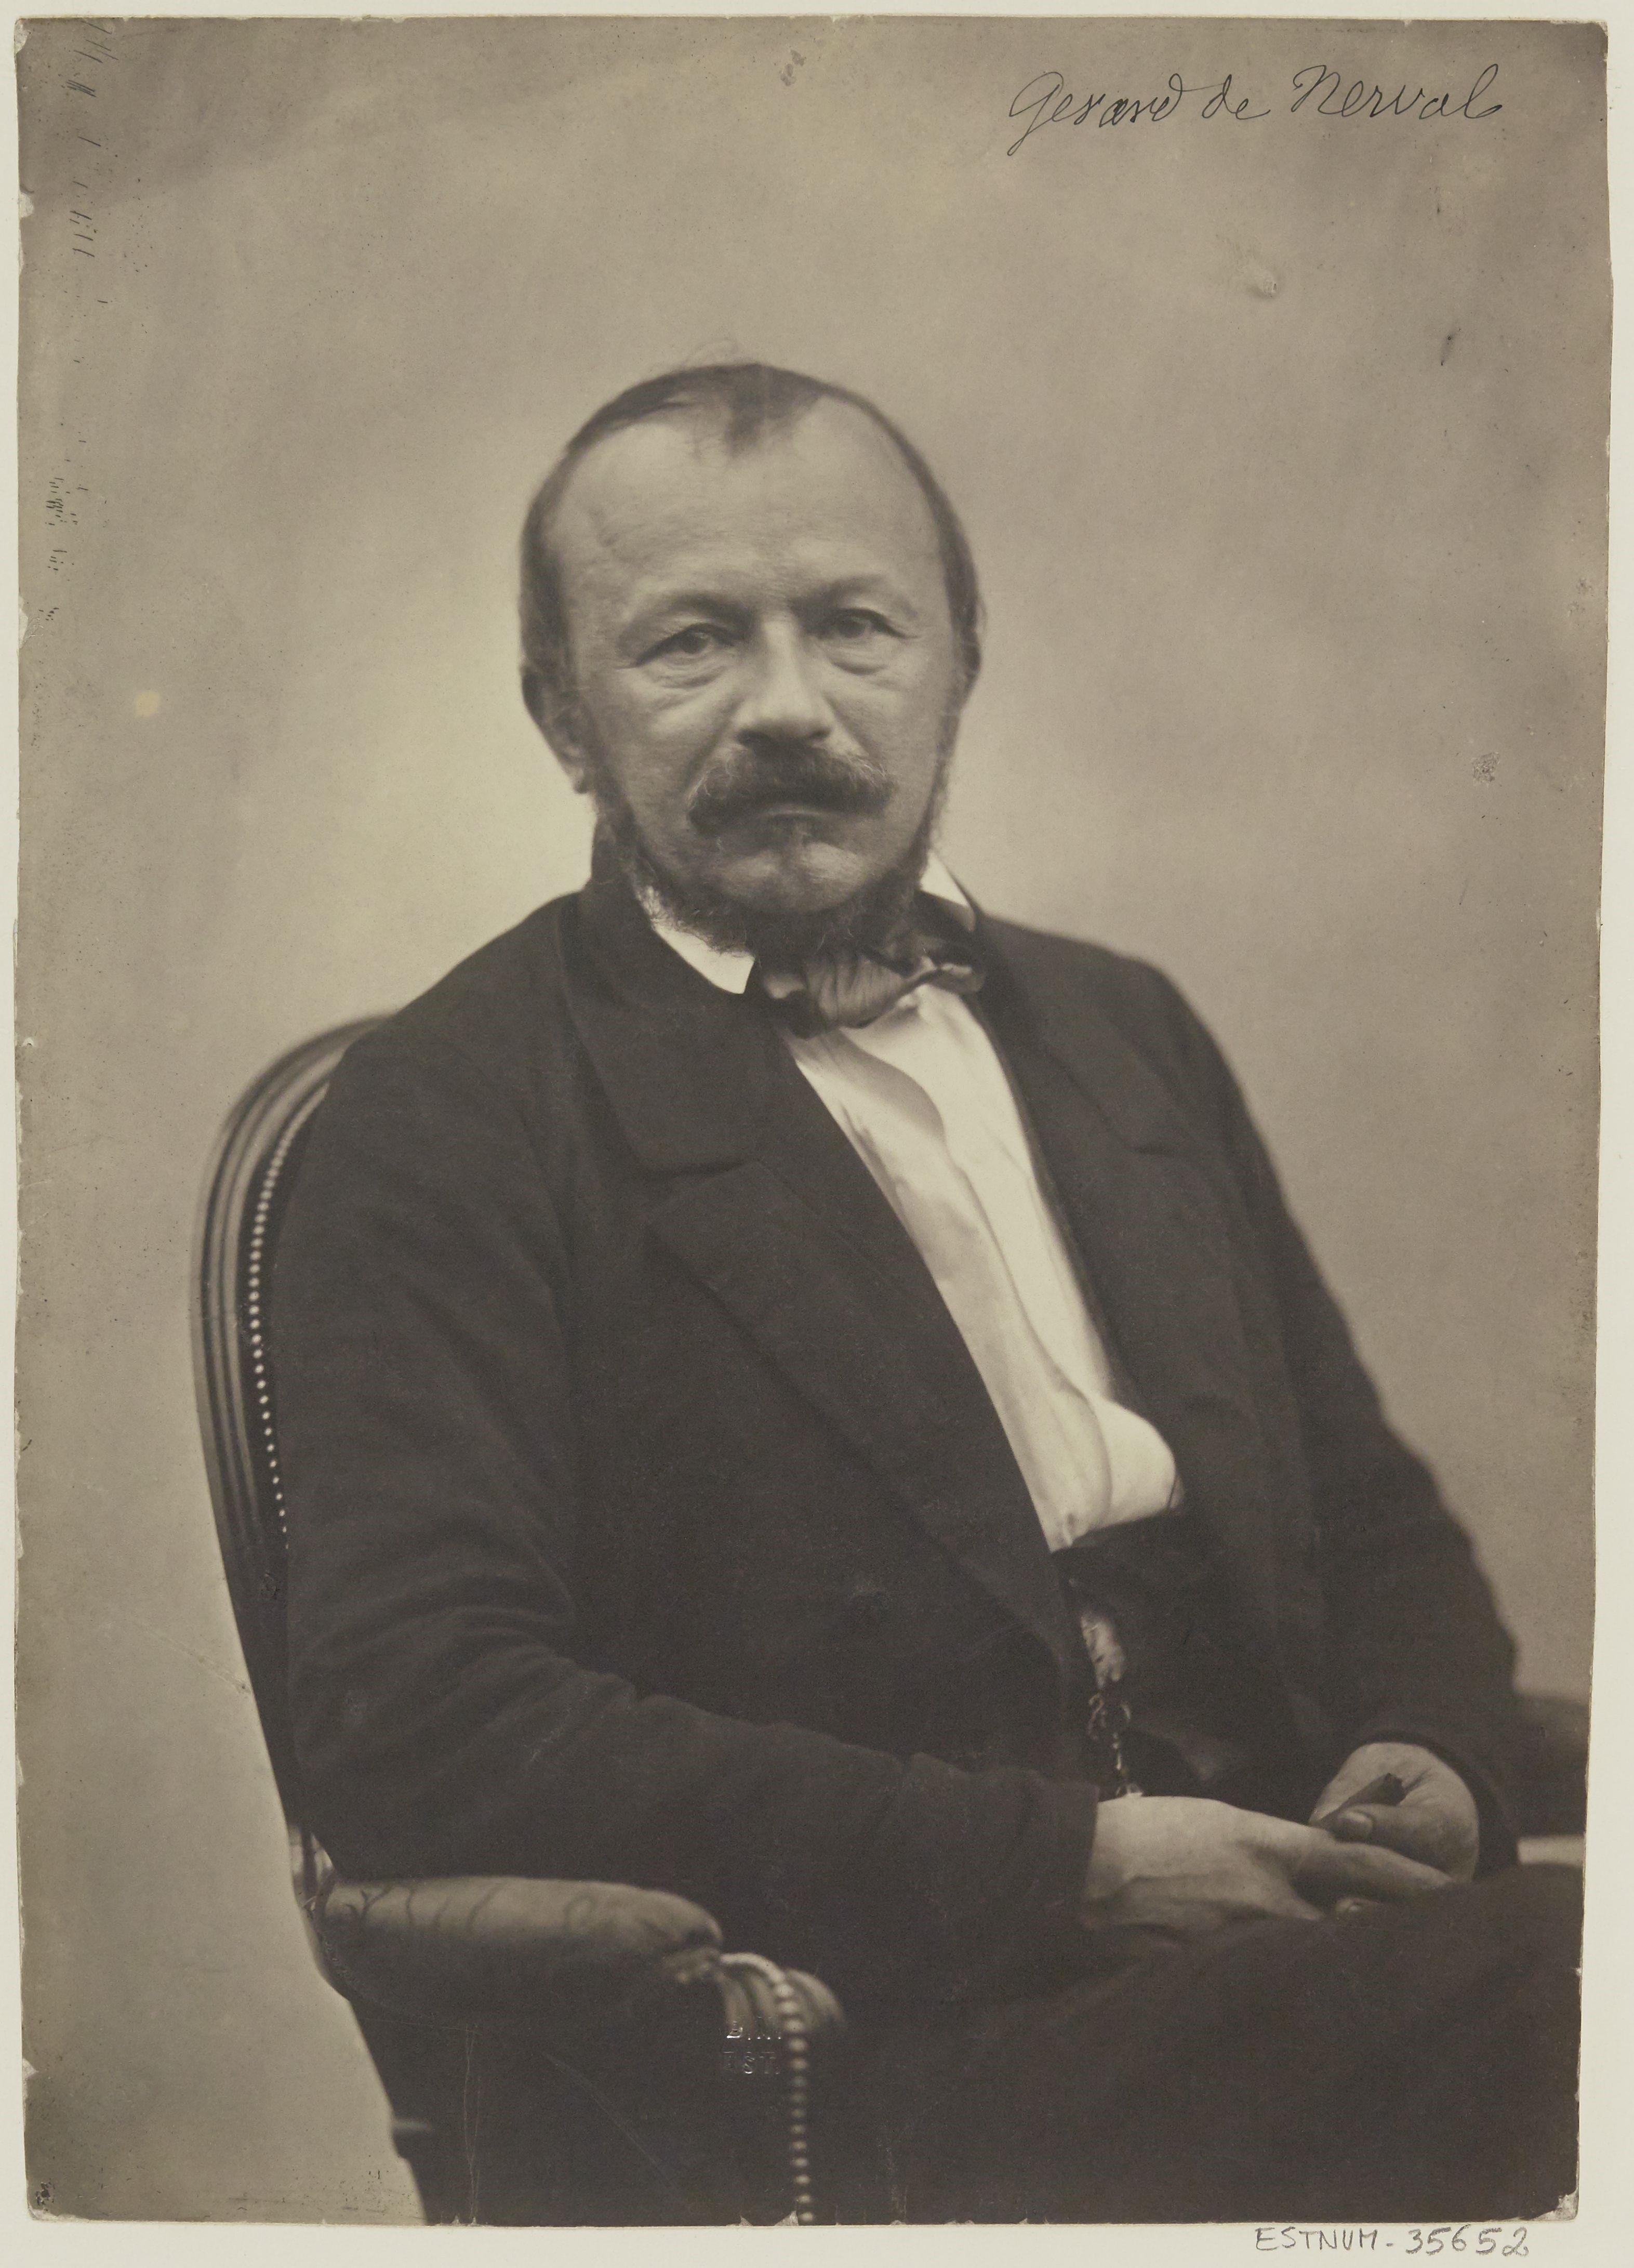 http://upload.wikimedia.org/wikipedia/commons/0/03/F%C3%A9lix_Nadar_1820-1910_portraits_G%C3%A9rard_de_Nerval.jpg